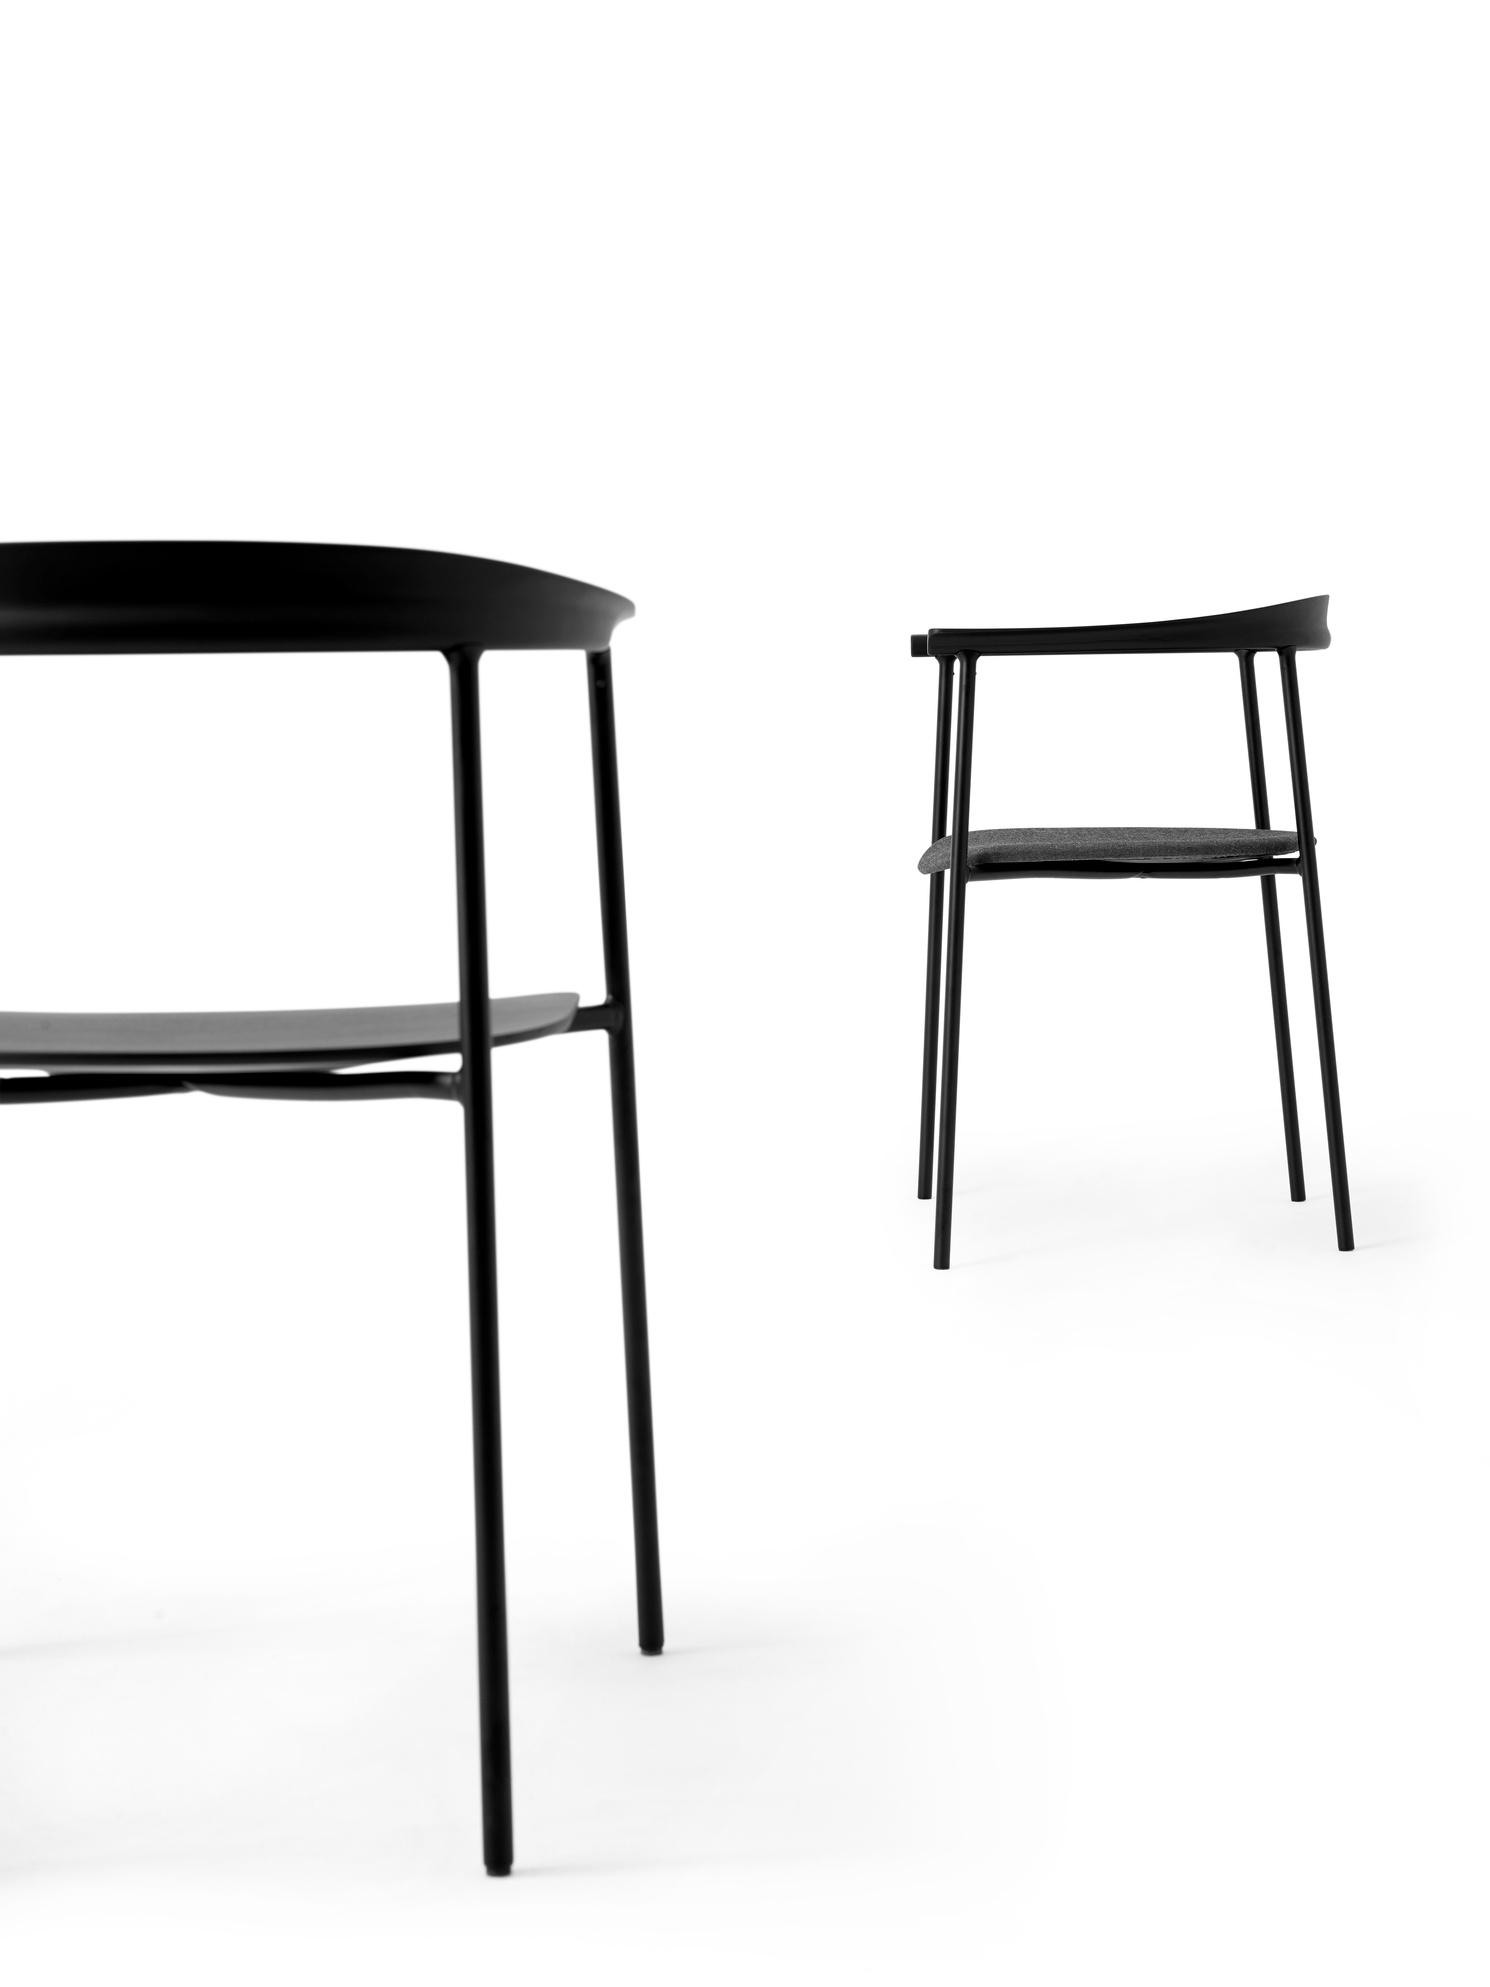 ARC_Chair_2020_07_09_TAKT_Compose_Wood_Gray